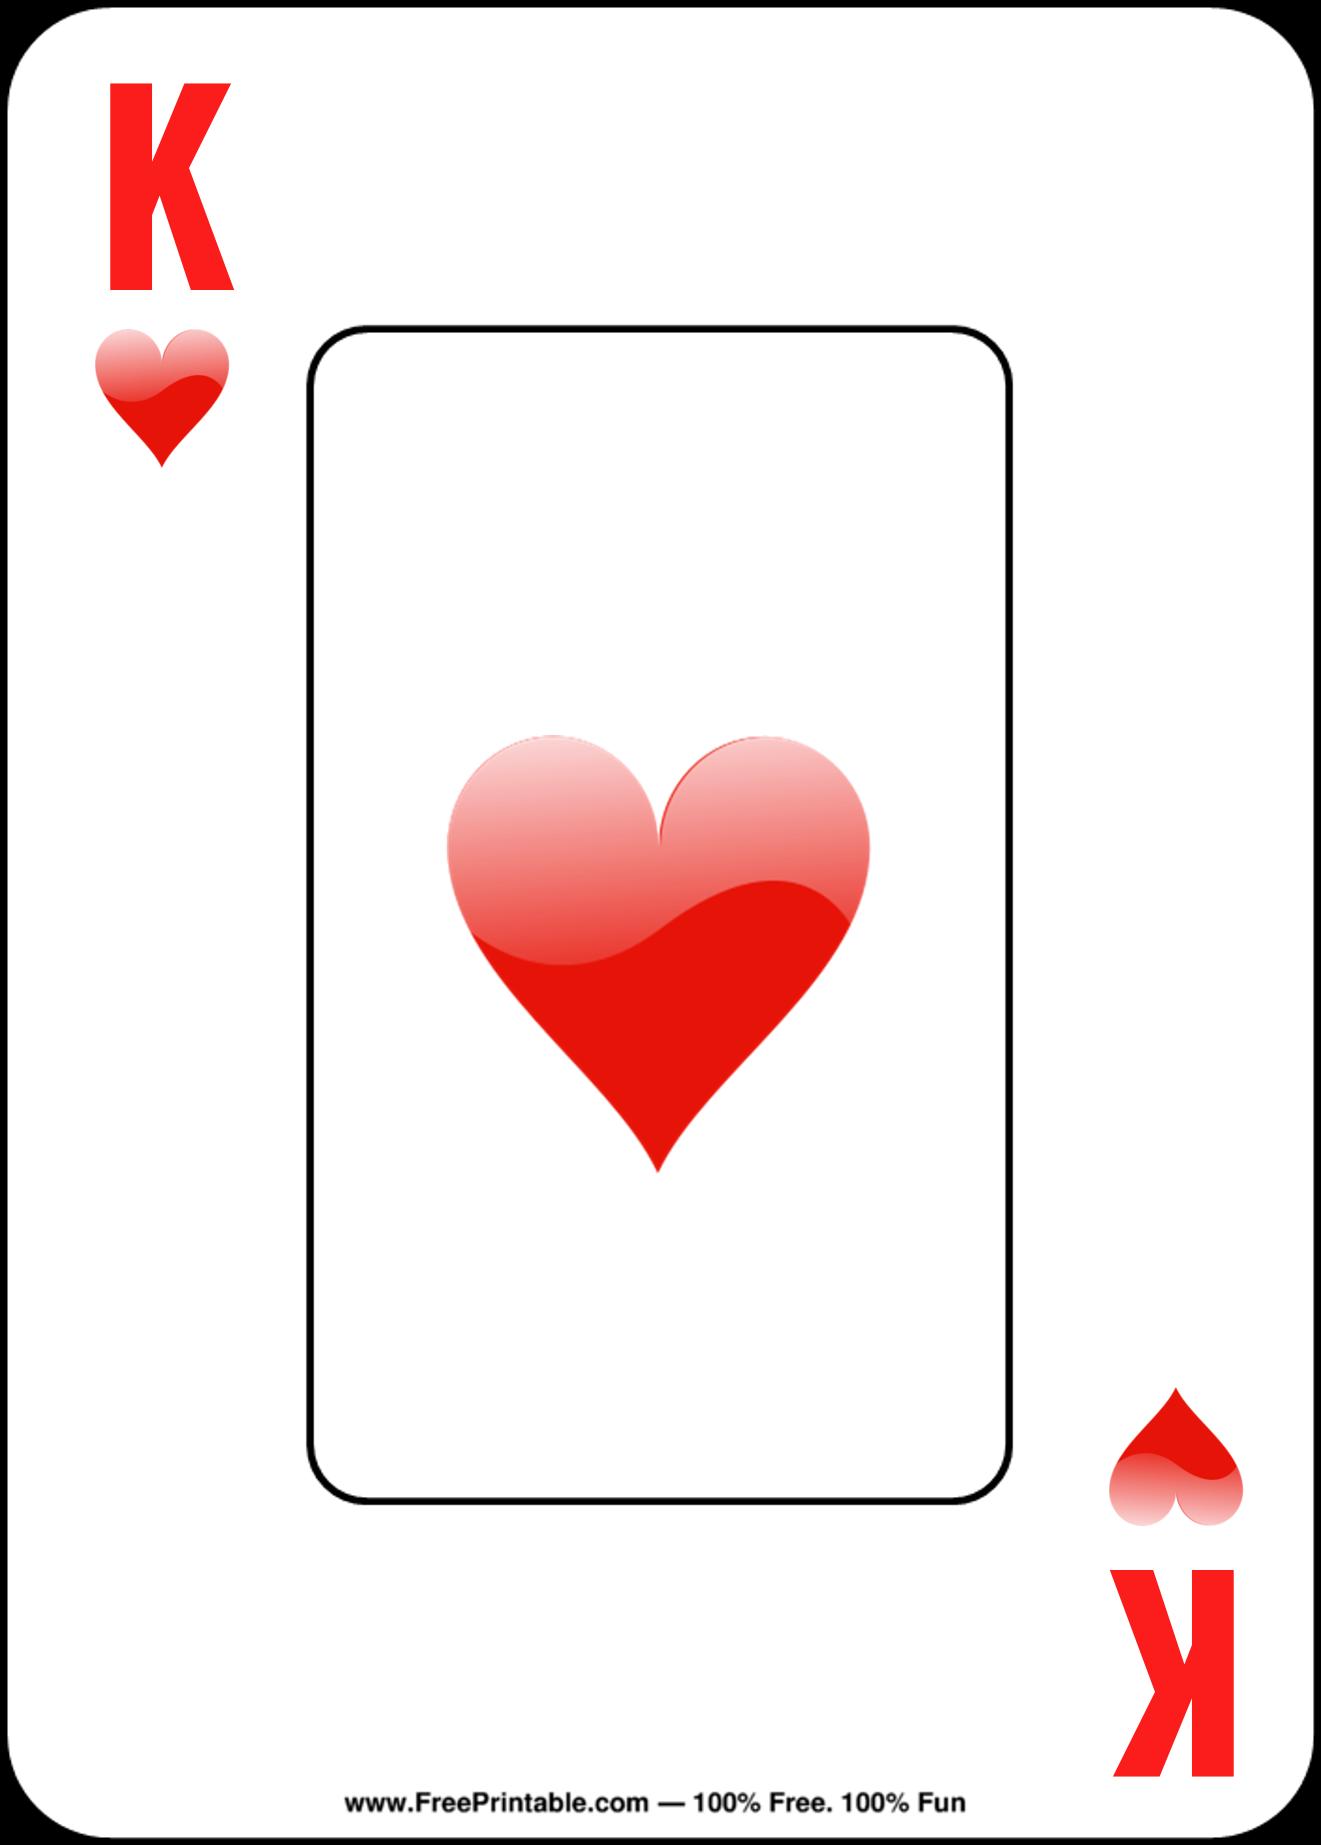 Free Printable Playing Cards